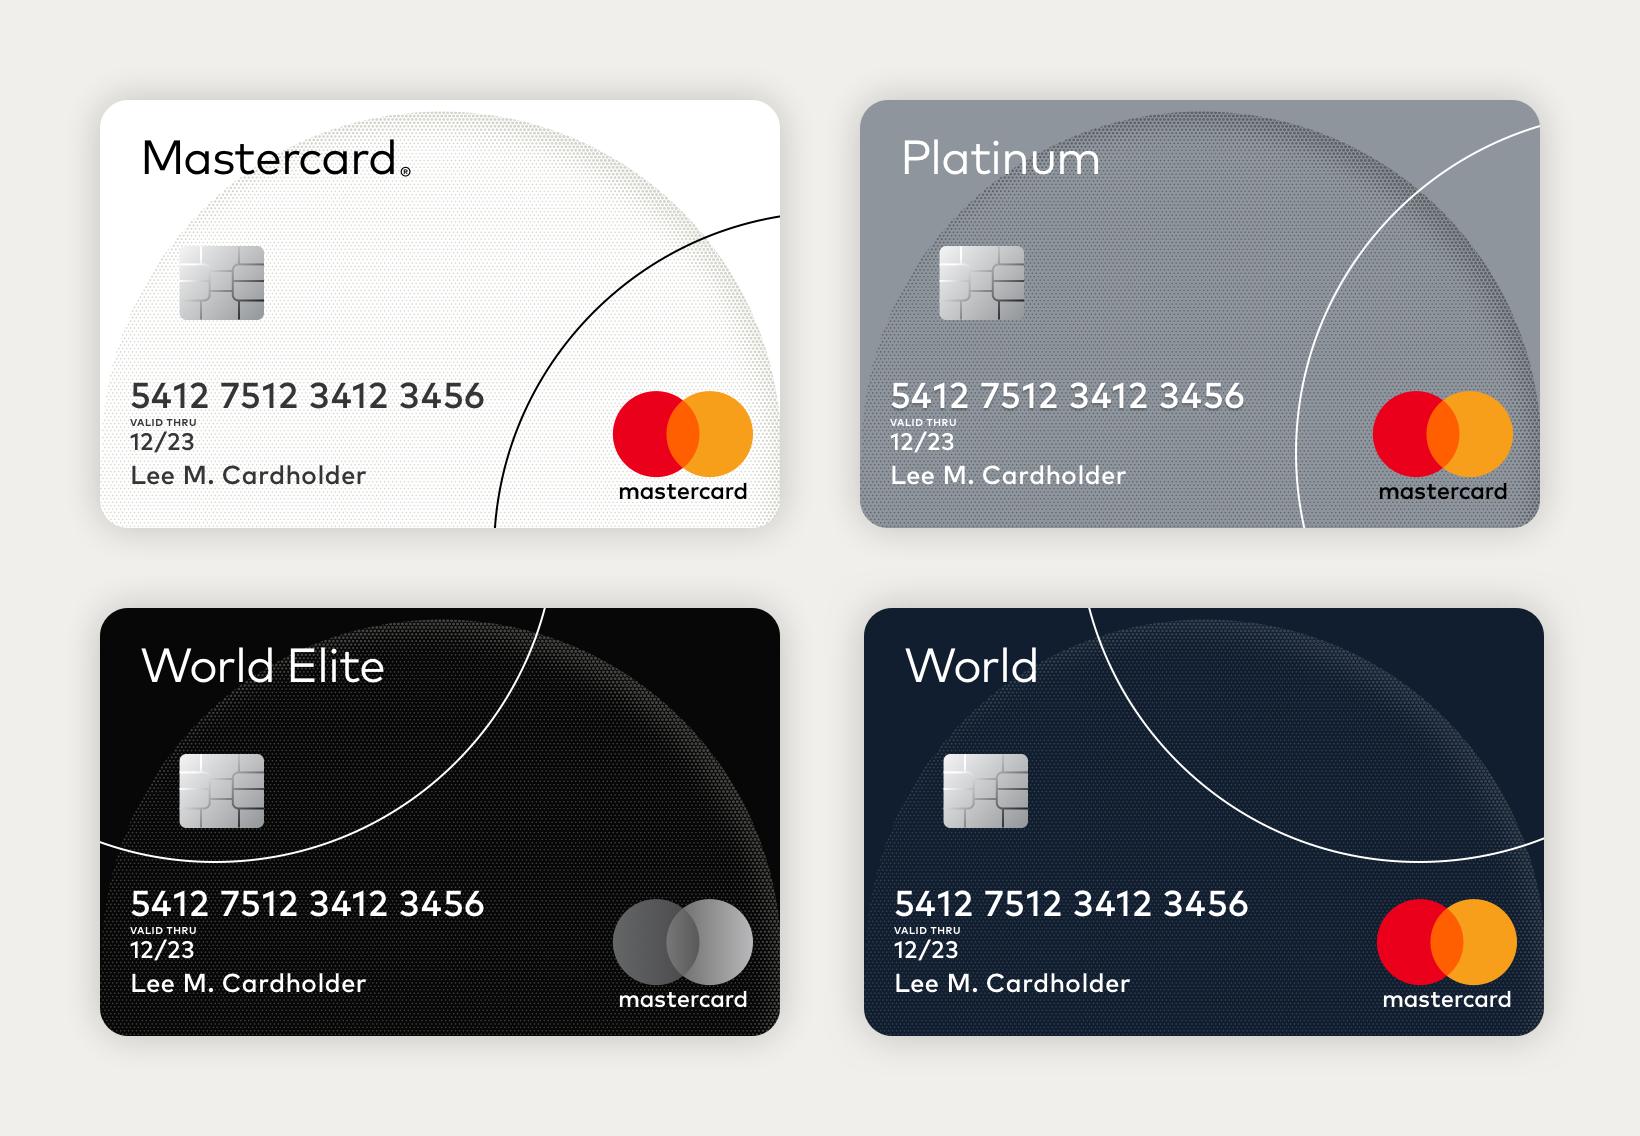 Free Sketch Mastercard Card Free Sketch Credit Card Design Debit Card Design Card Sketches Templates